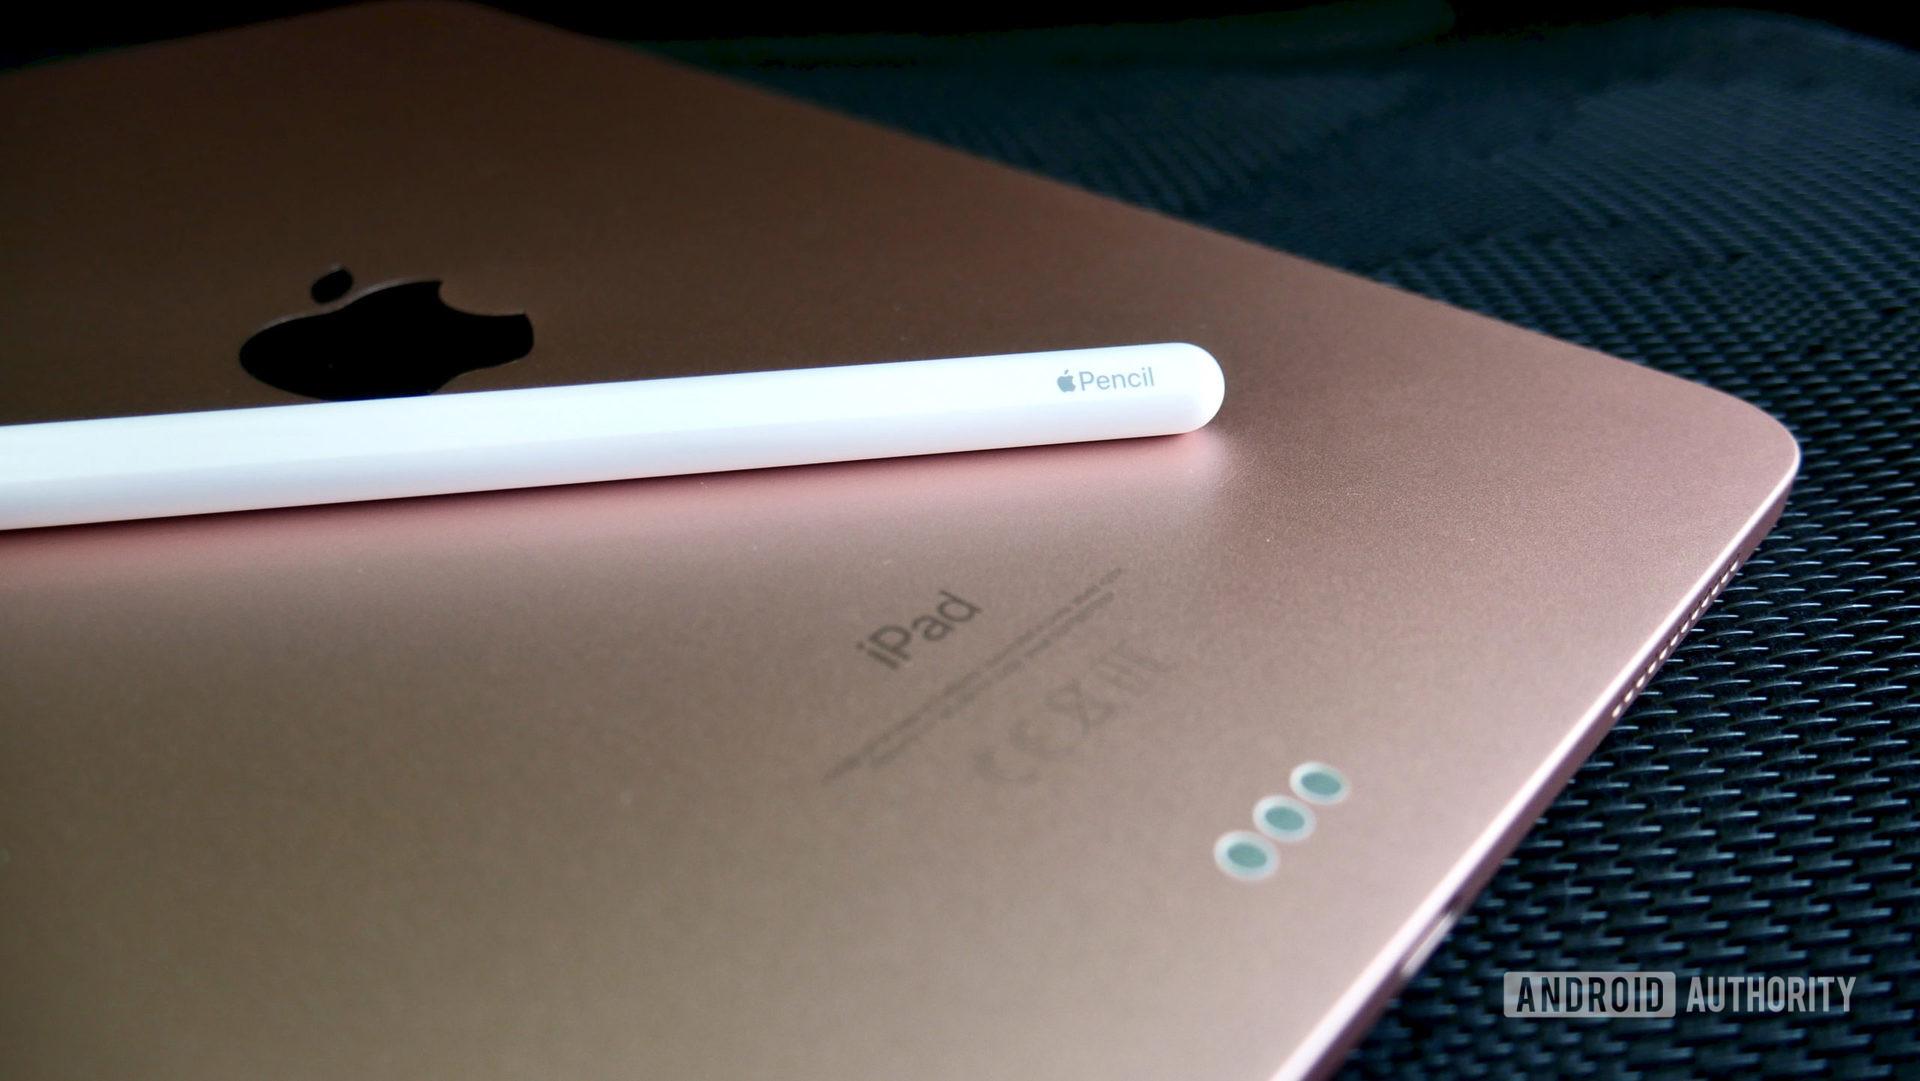 apple ipad air 2020 review pencil